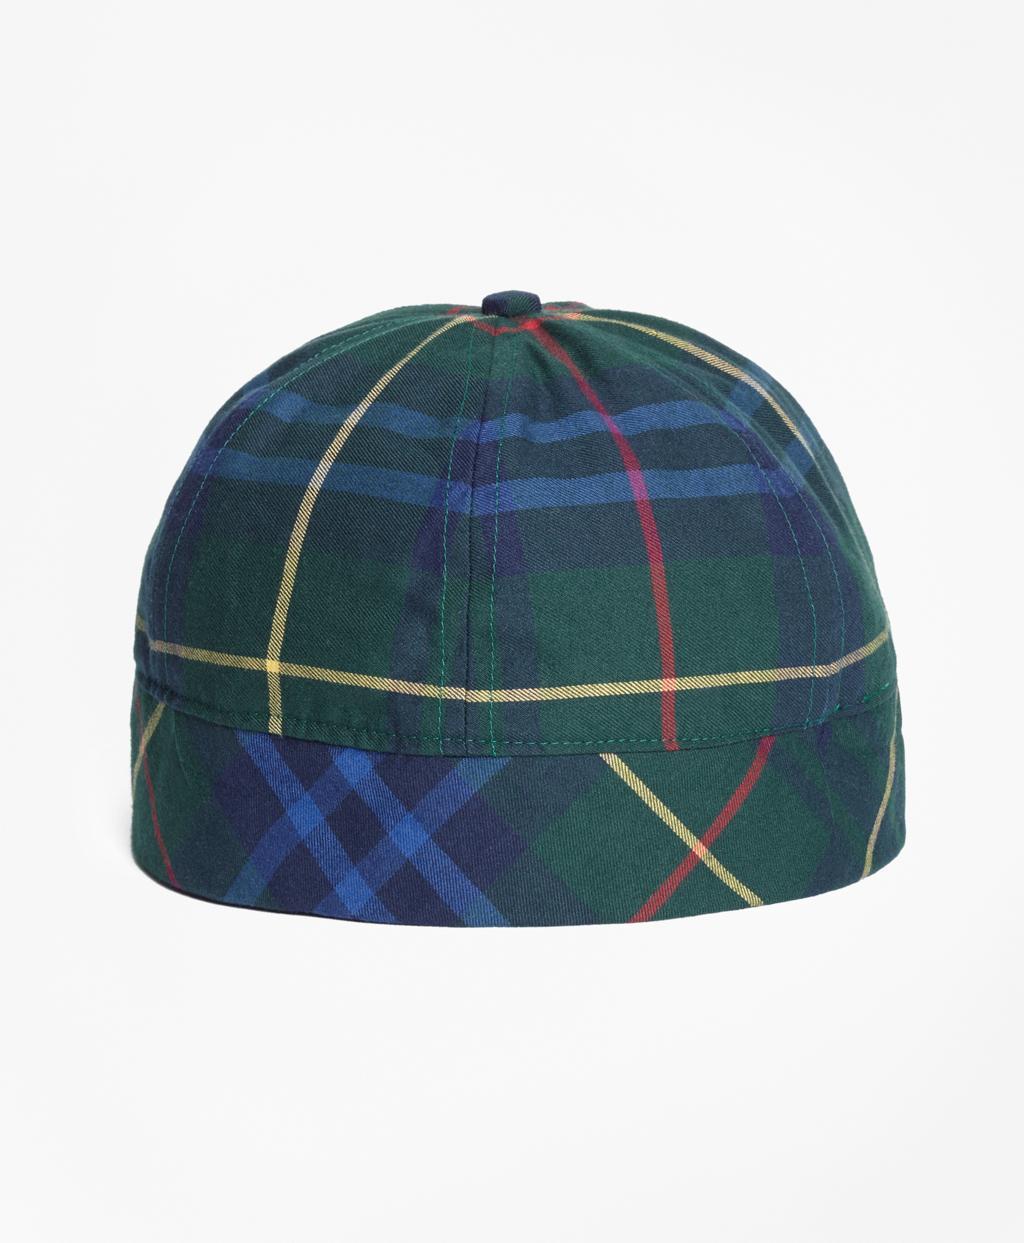 51d9902c1f9 Lyst - Brooks Brothers Tartan Wool-blend Cap in Green for Men